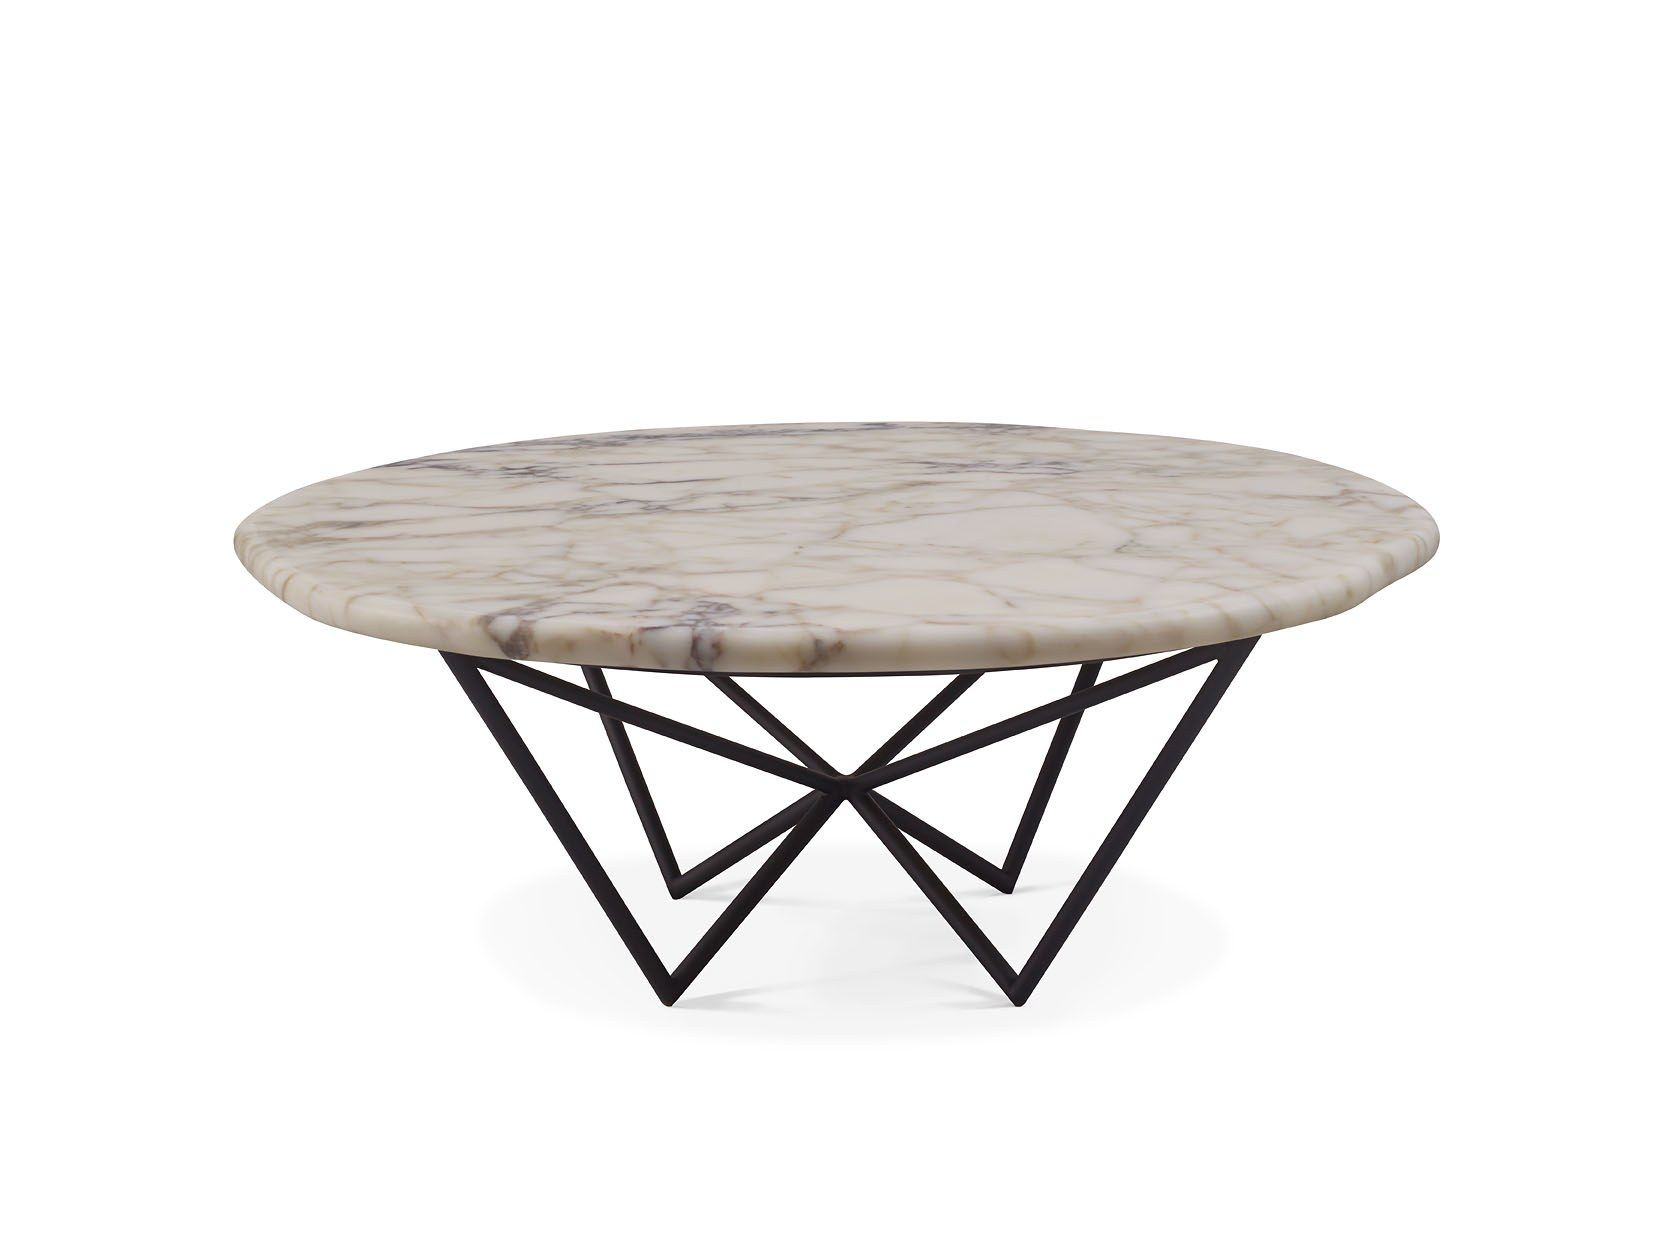 A Closer Look At Kara Mannu0027s Sleek Furniture Collection For Baker